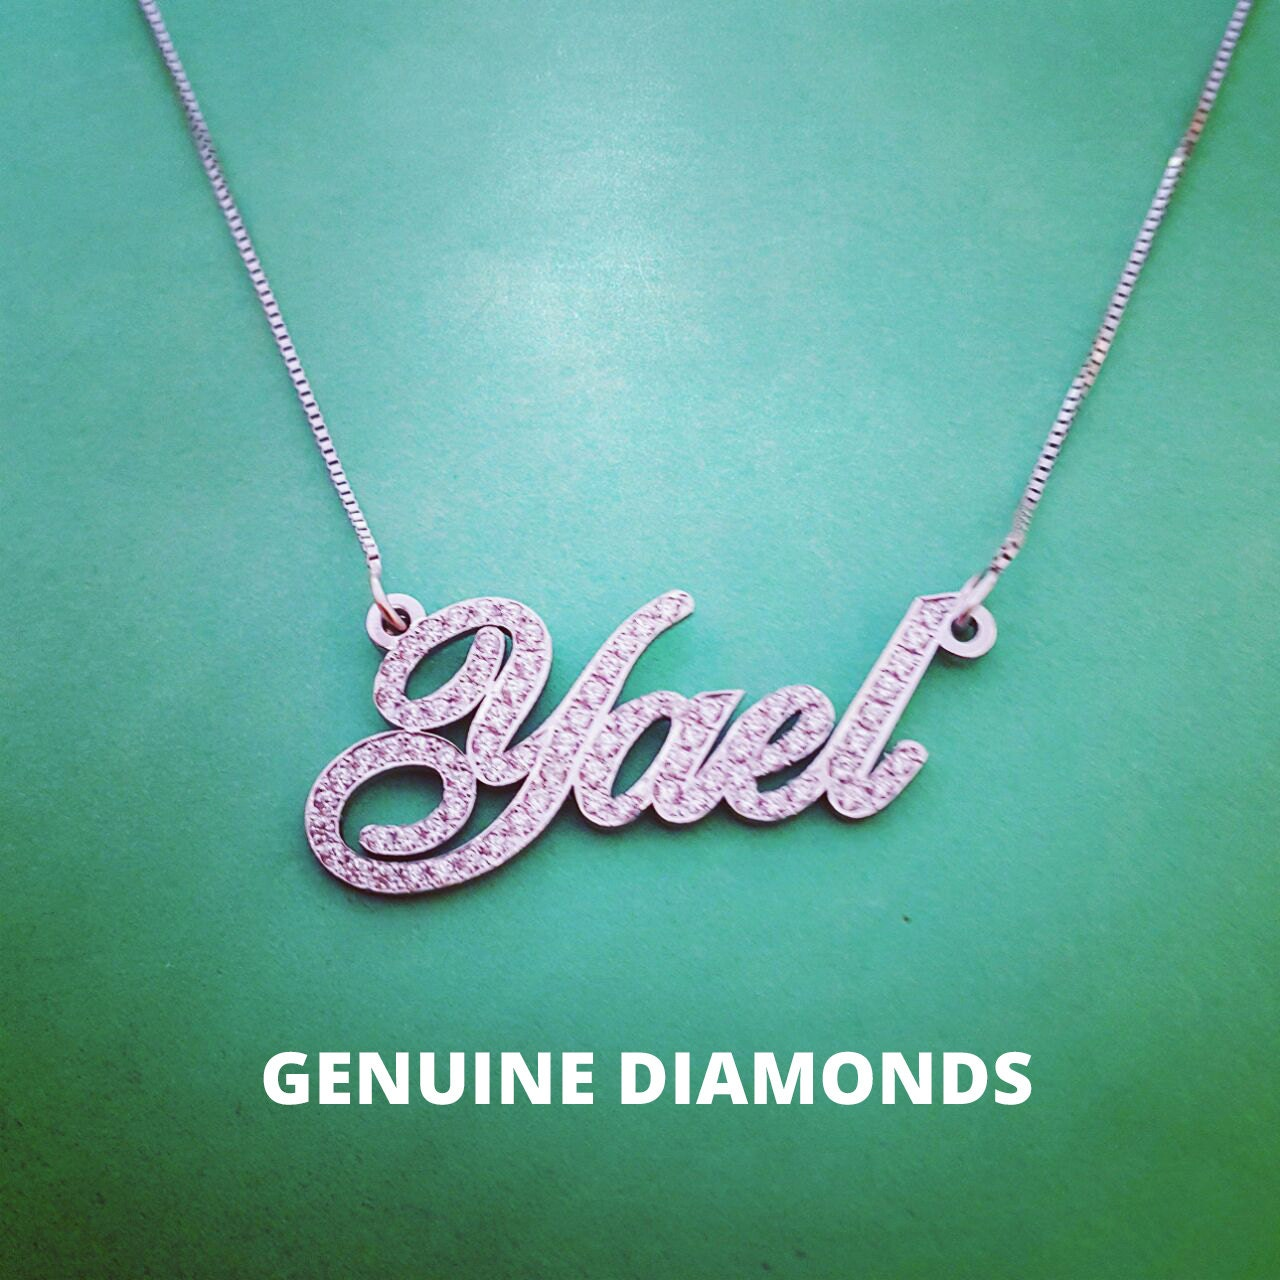 pave design name necklace 14k white gold genuine diamonds. Black Bedroom Furniture Sets. Home Design Ideas